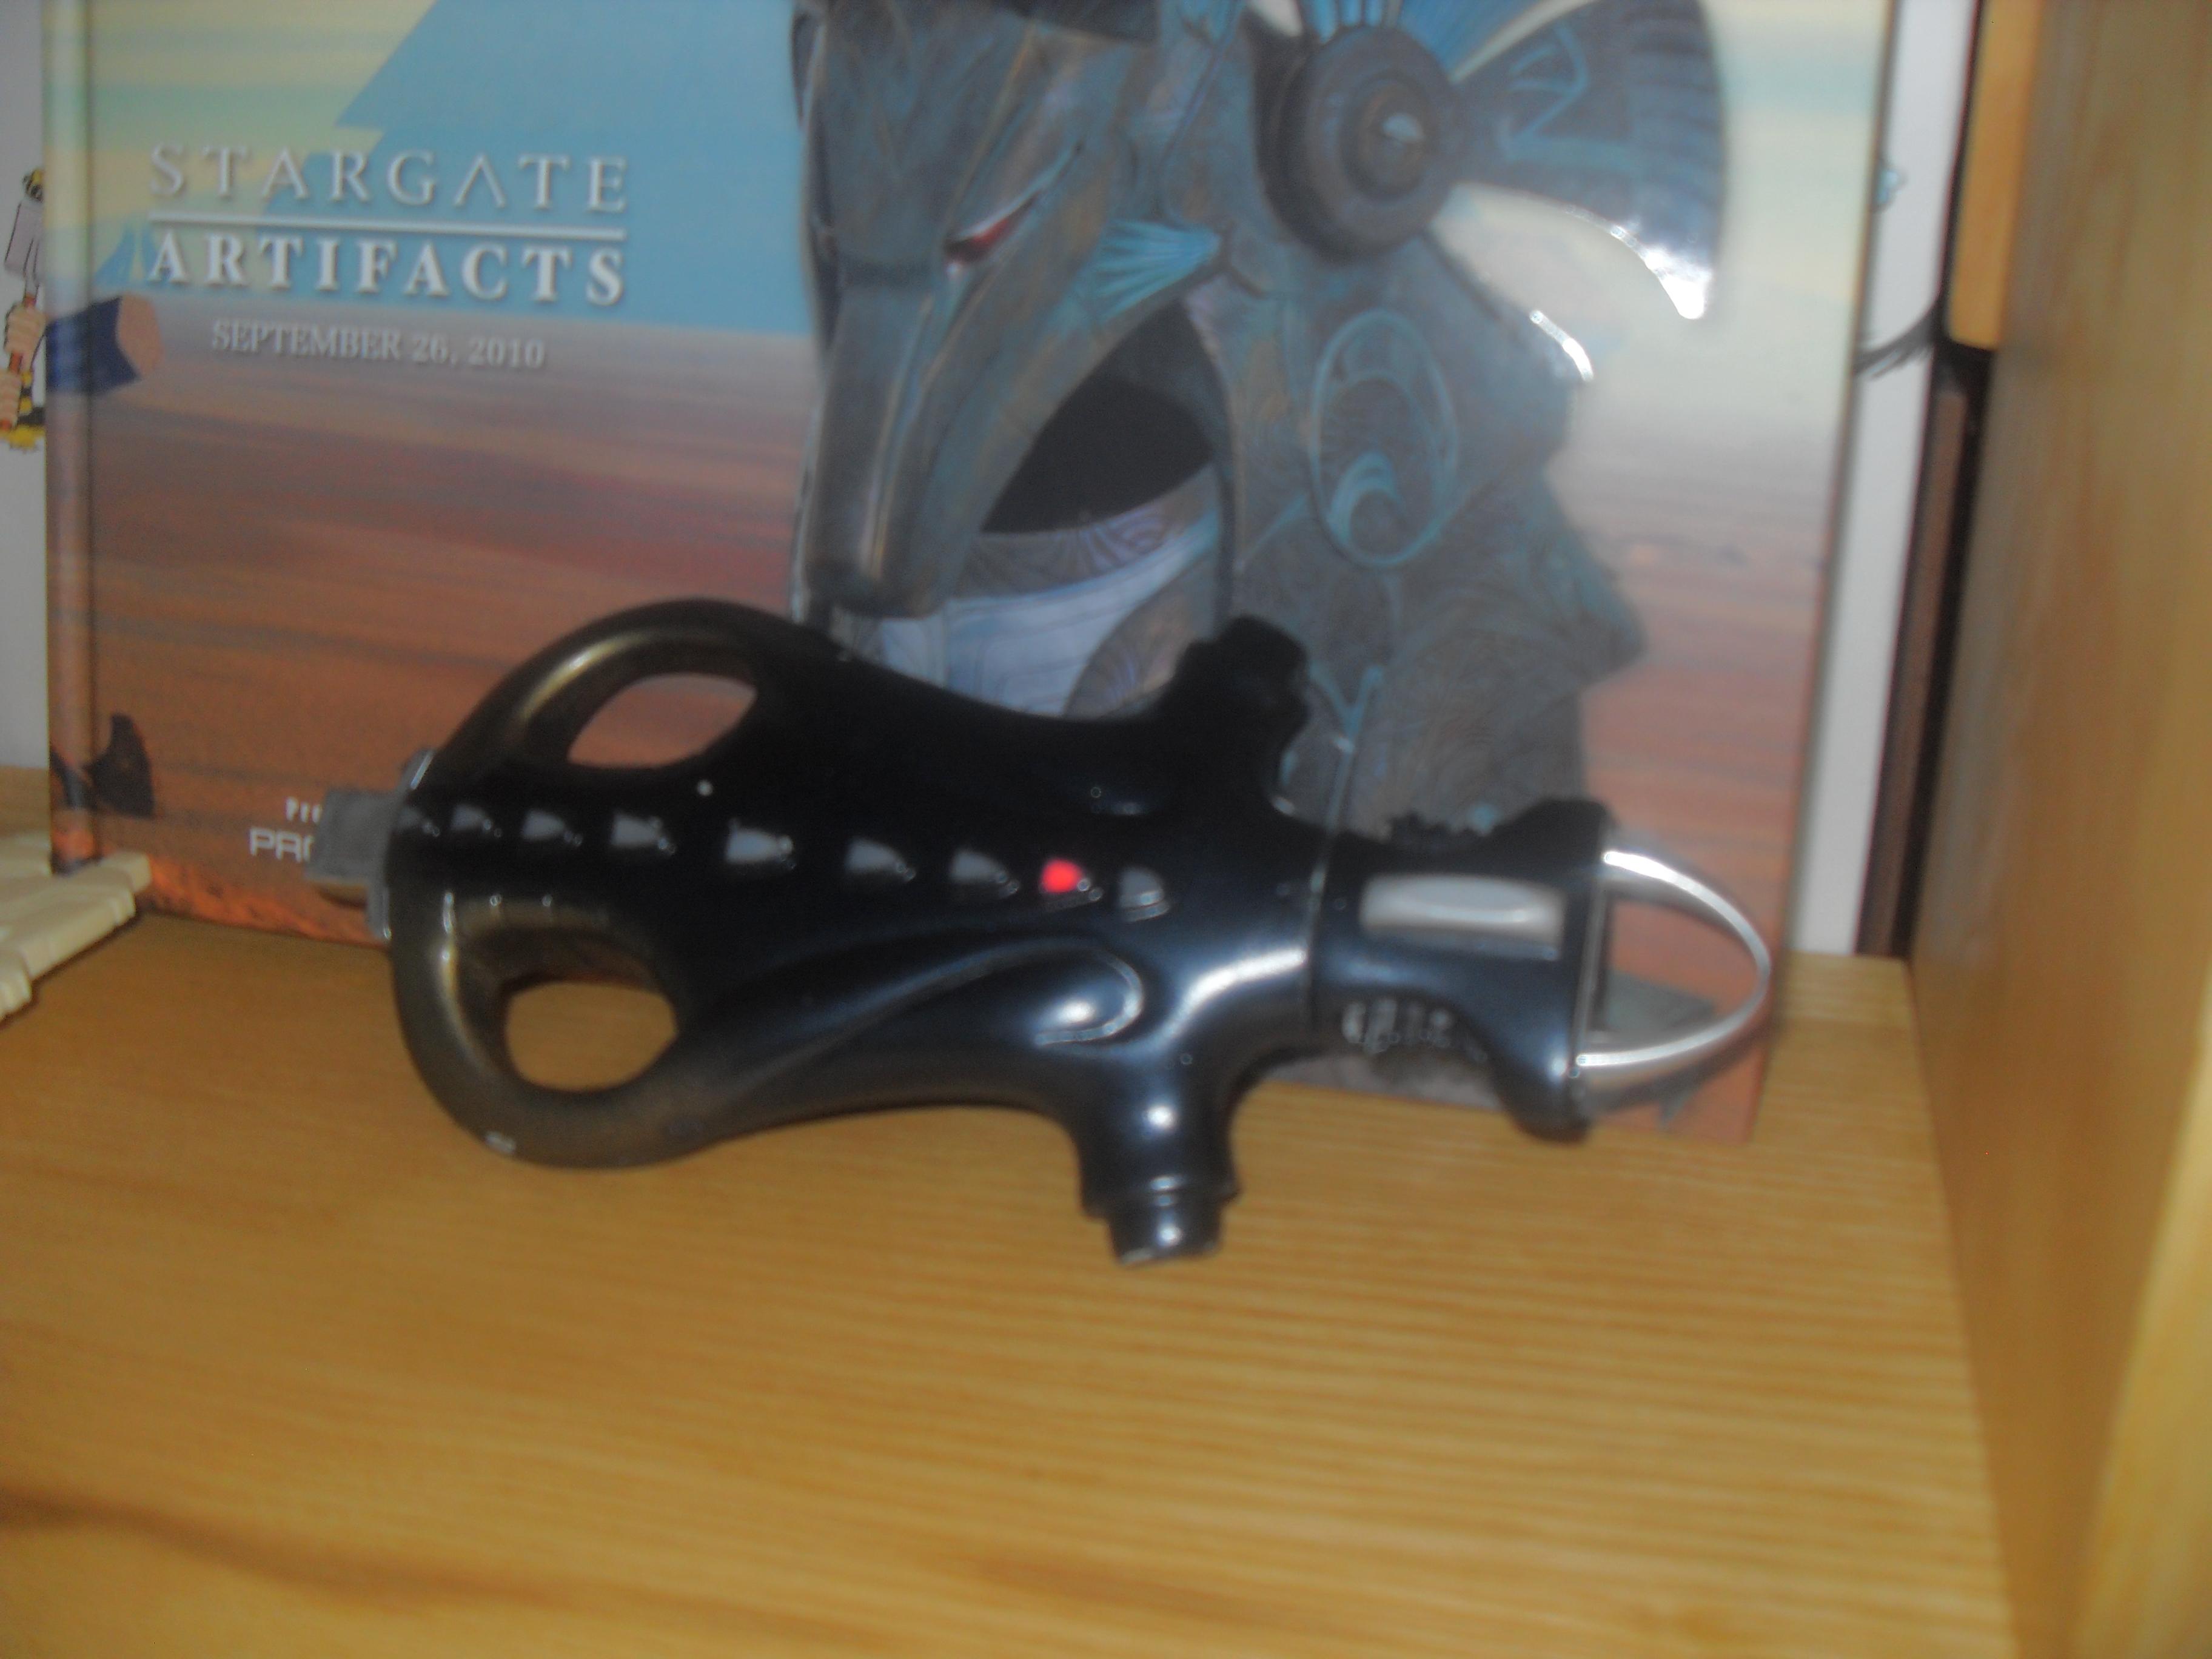 Collection Stargate à Merlin68 Sdc12581a